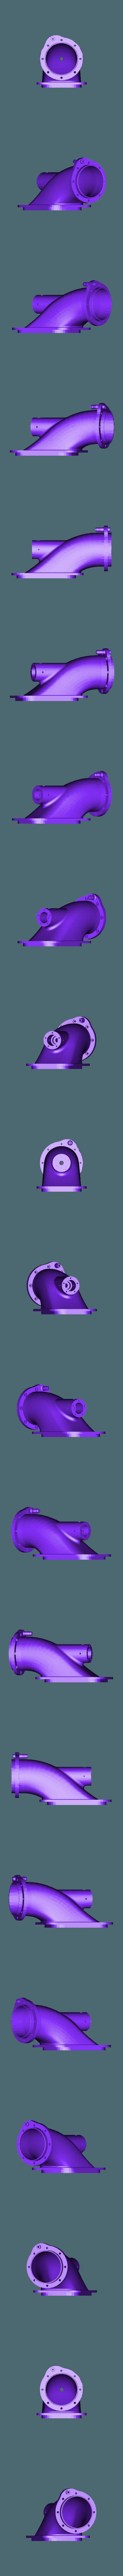 inlet.STL Download STL file Water Jet propulsion unit • 3D print design, toto44